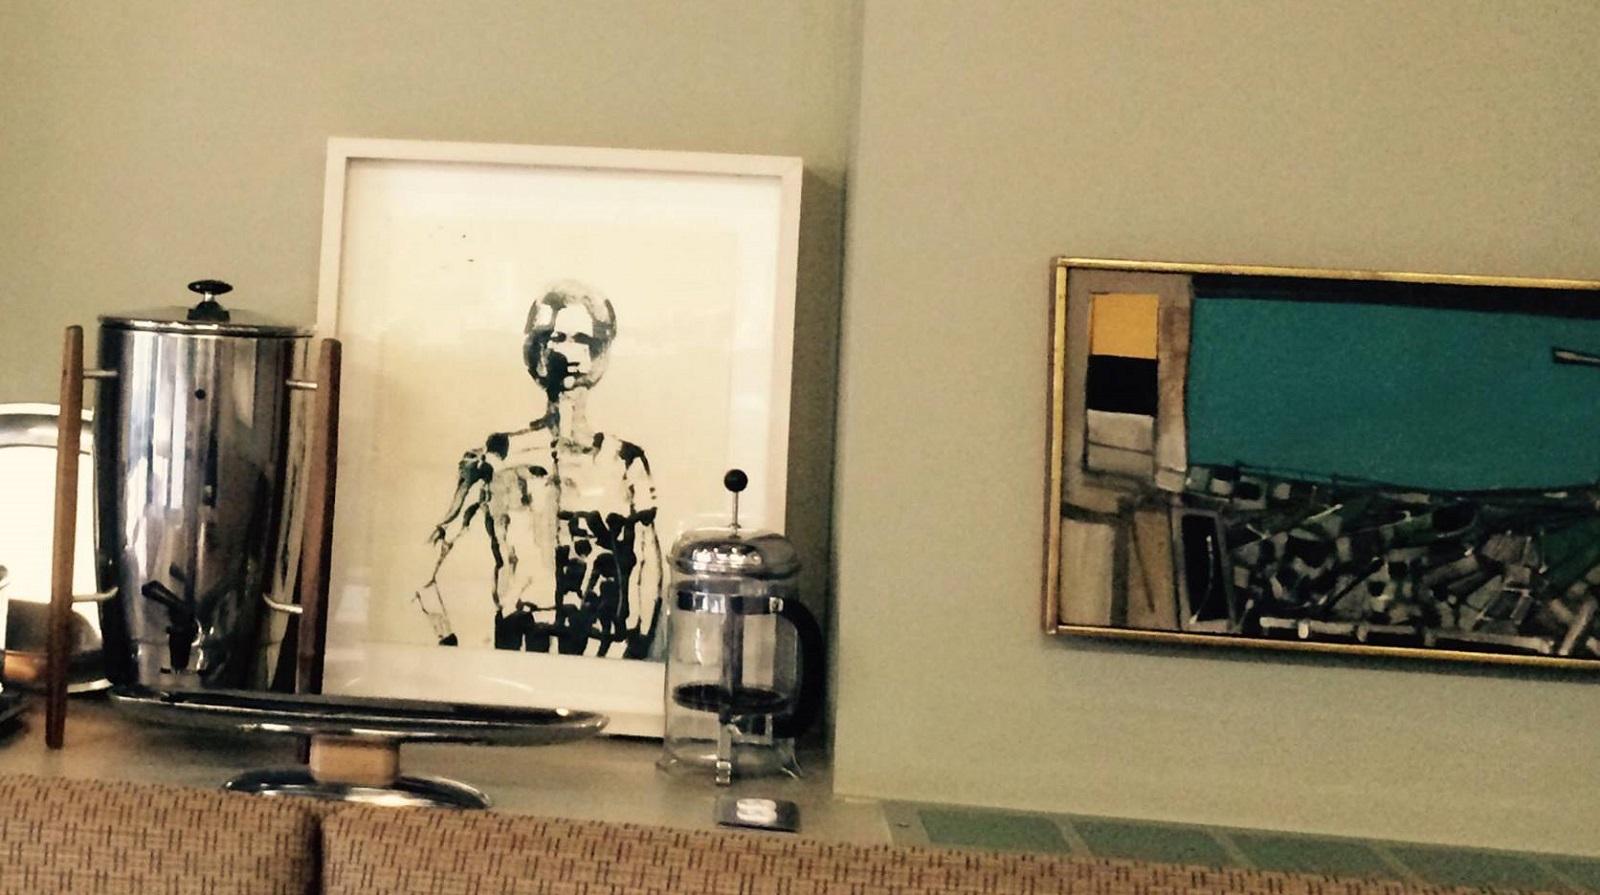 An image inside Buffalo Rome, via the Porter Avenue restaurant's Facebook page.